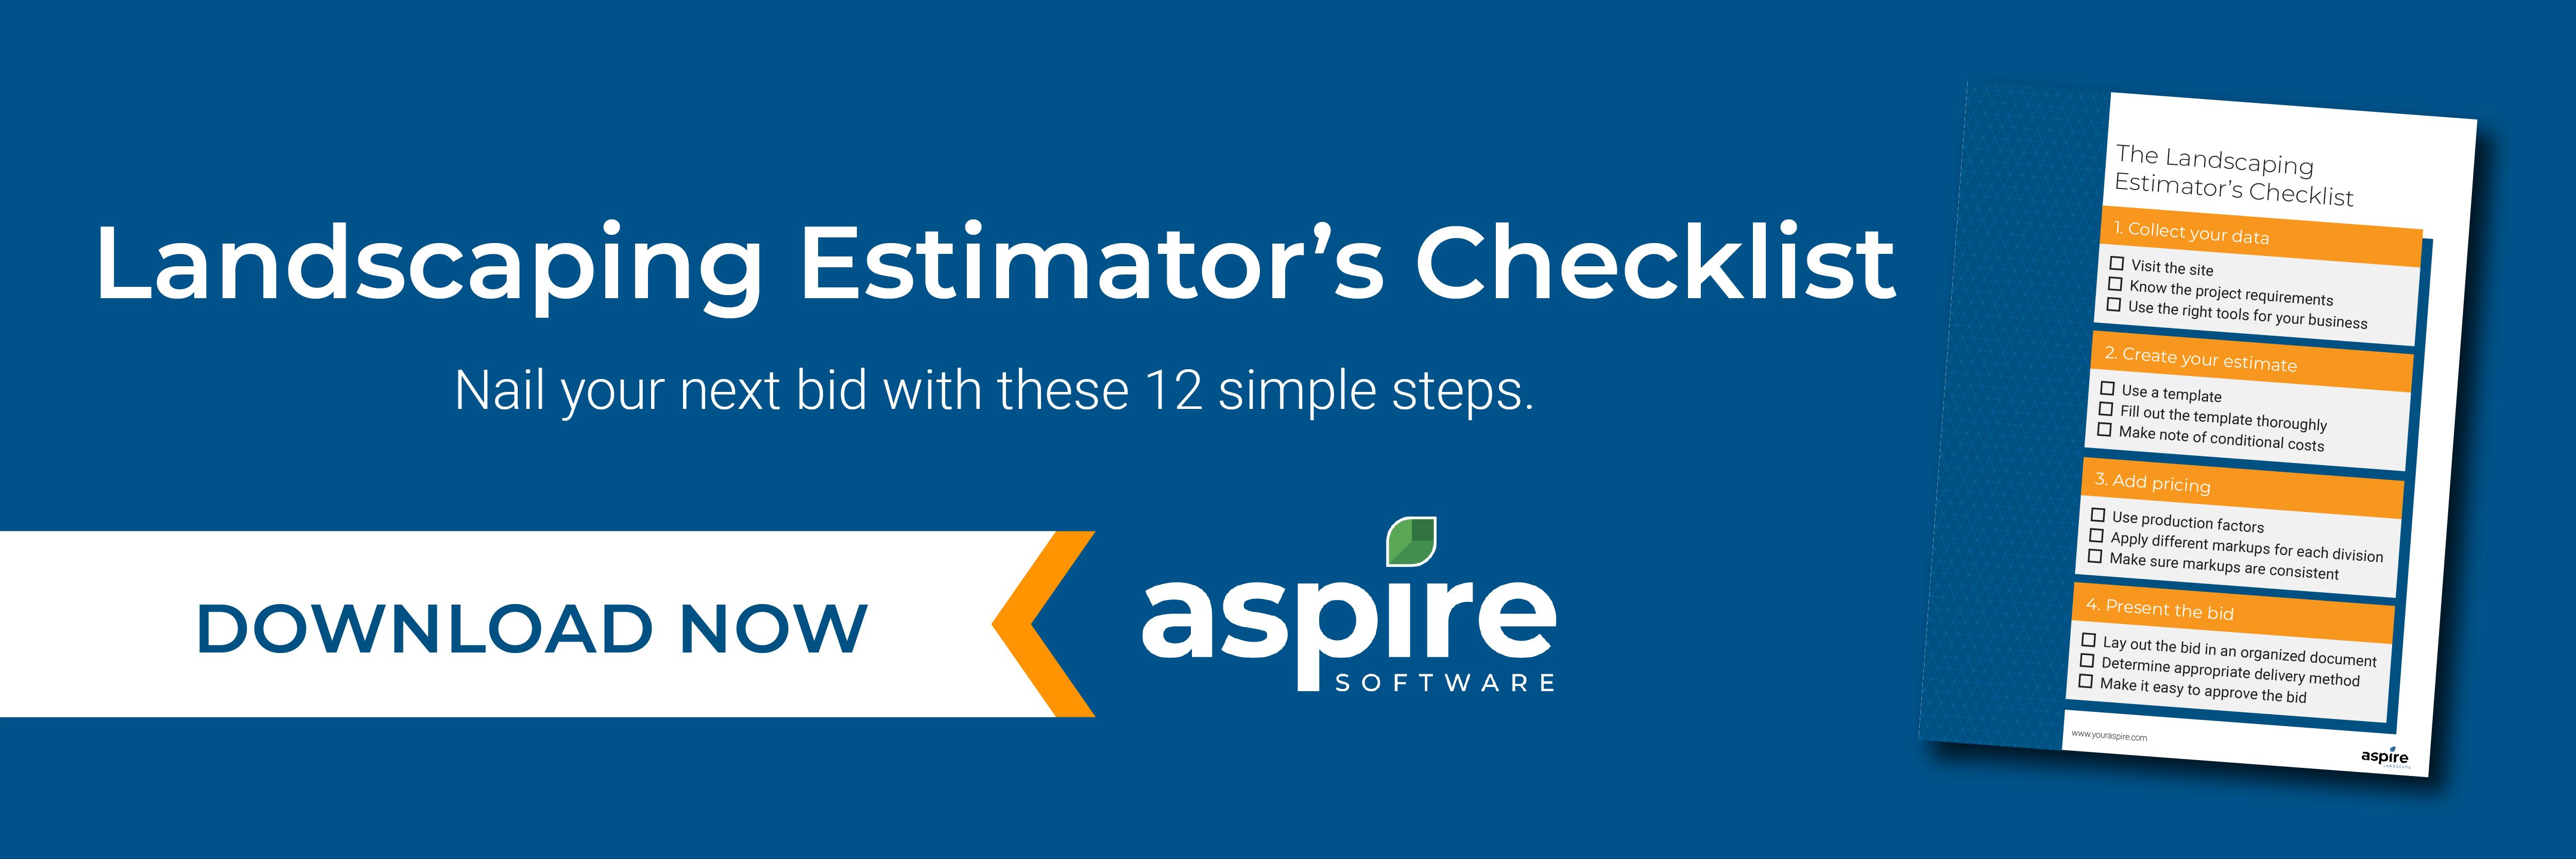 Download the landscaping estimator's checklist